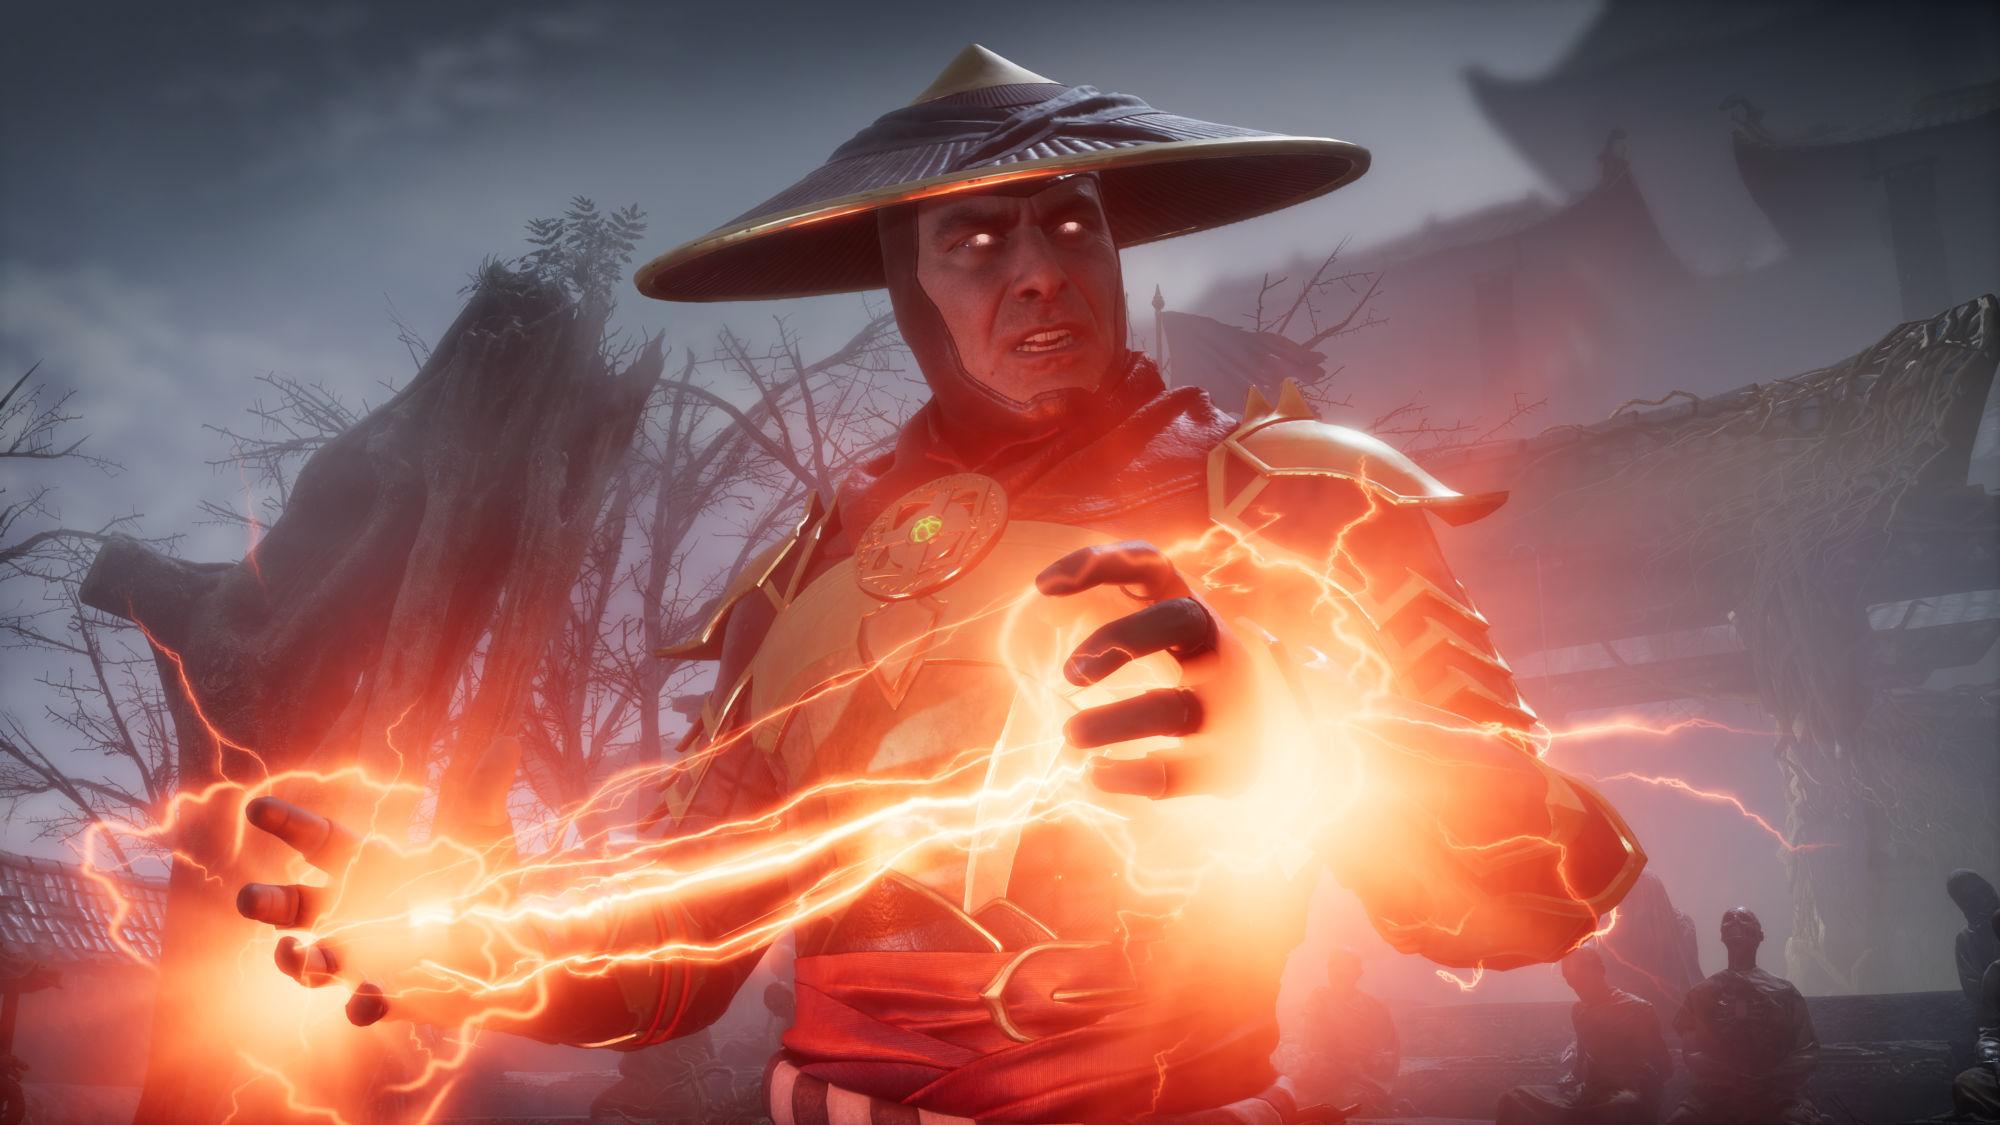 More of Mortal Kombat 11's Roster Leaked on Reddit